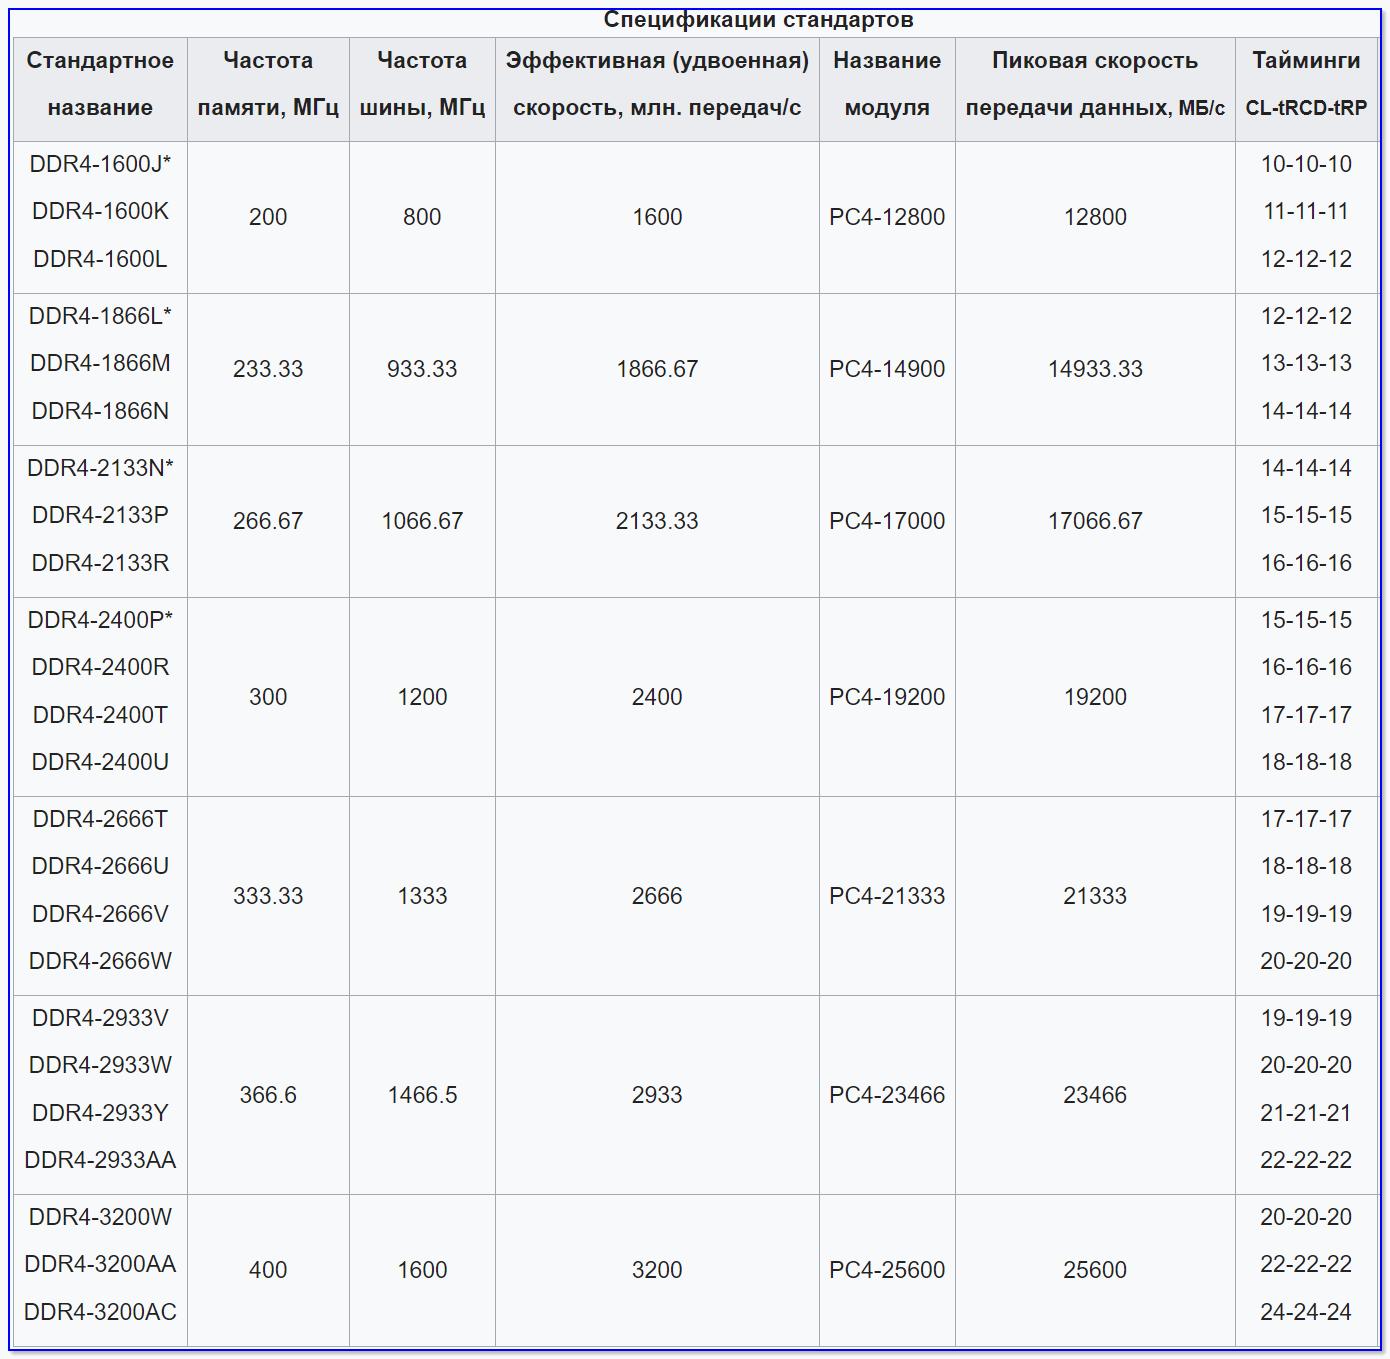 DDR4 - спецификация стандартов